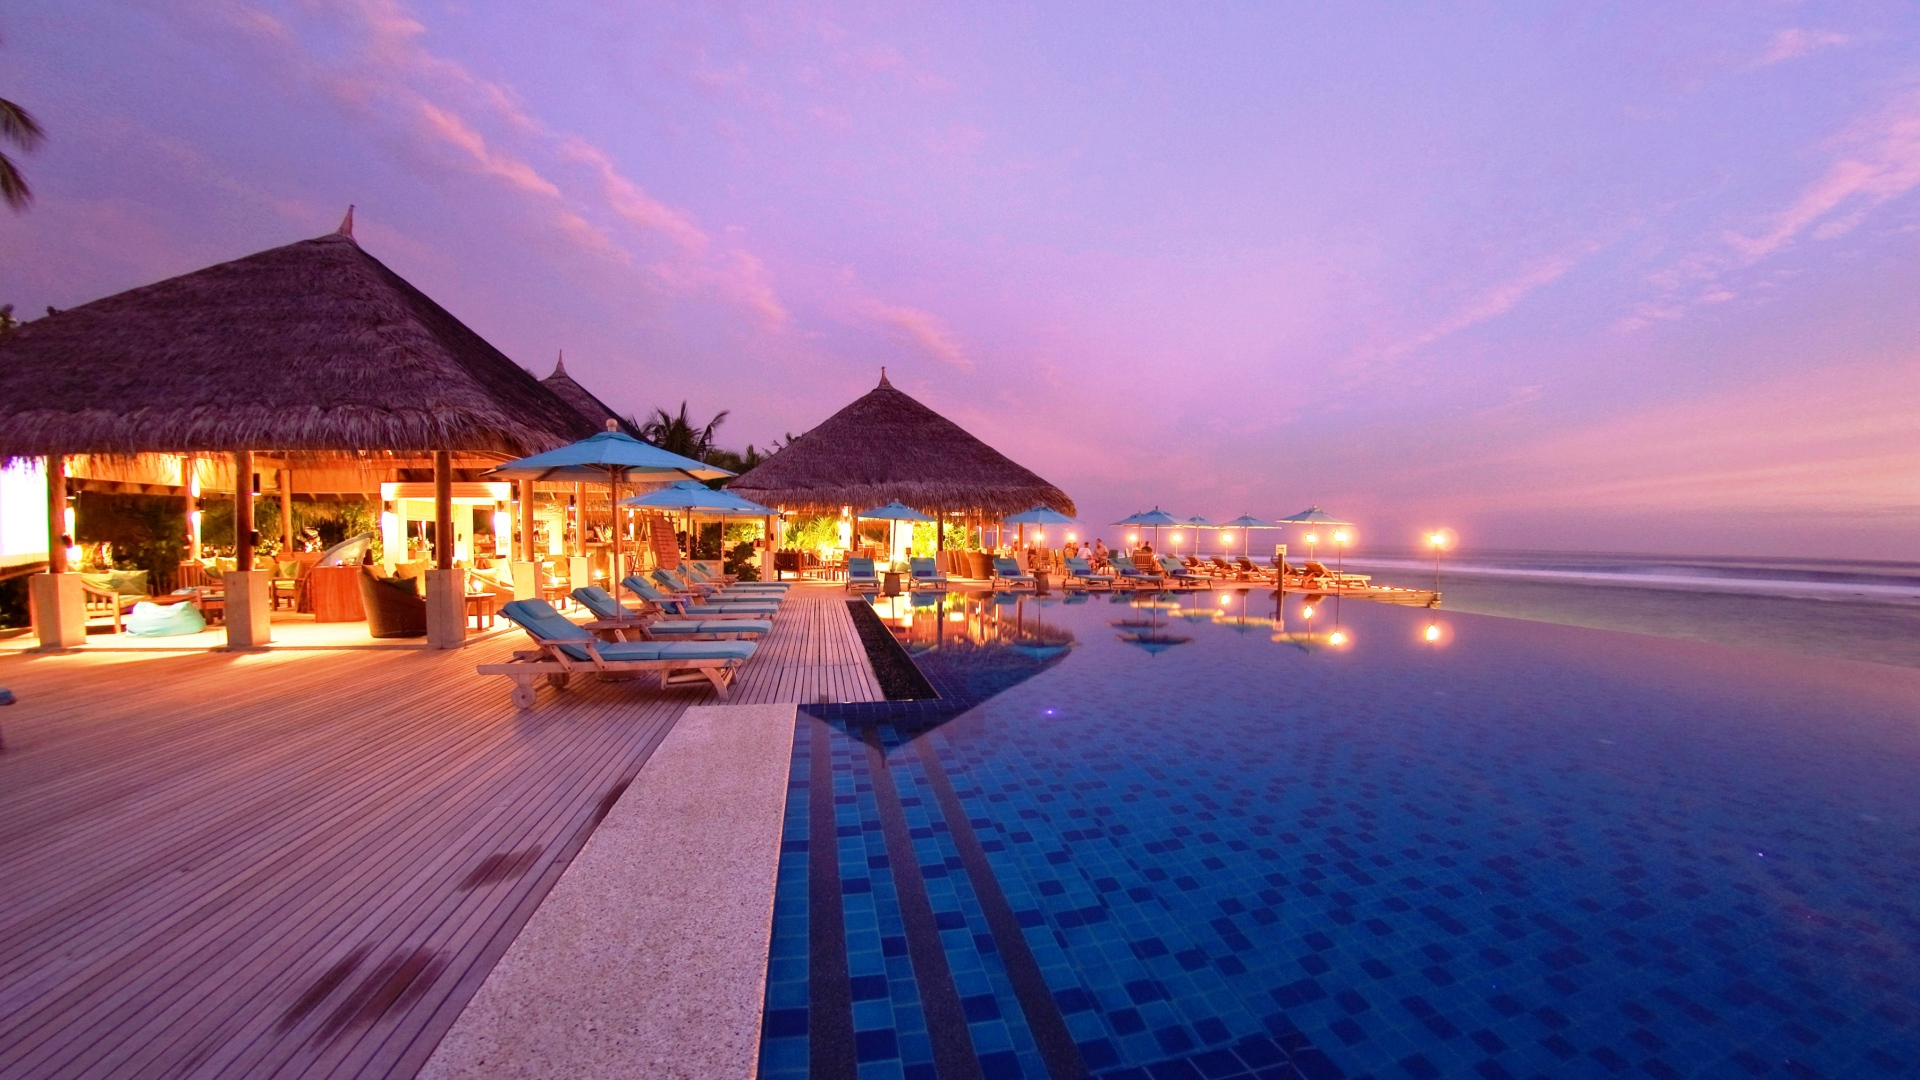 Tropical Beach Resort Evening Wallpaper Background Full HD 1080p 1920x1080